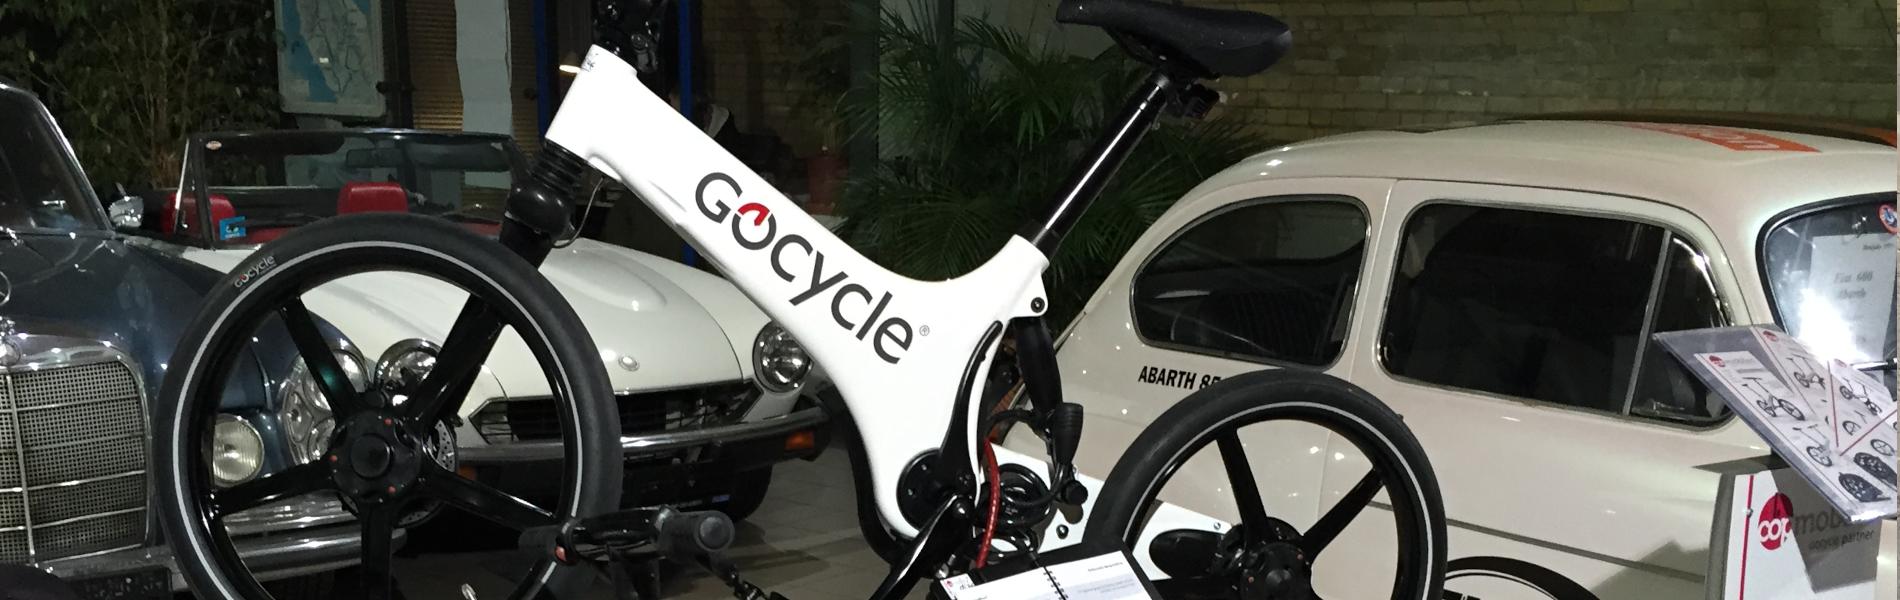 Banner Gocycles